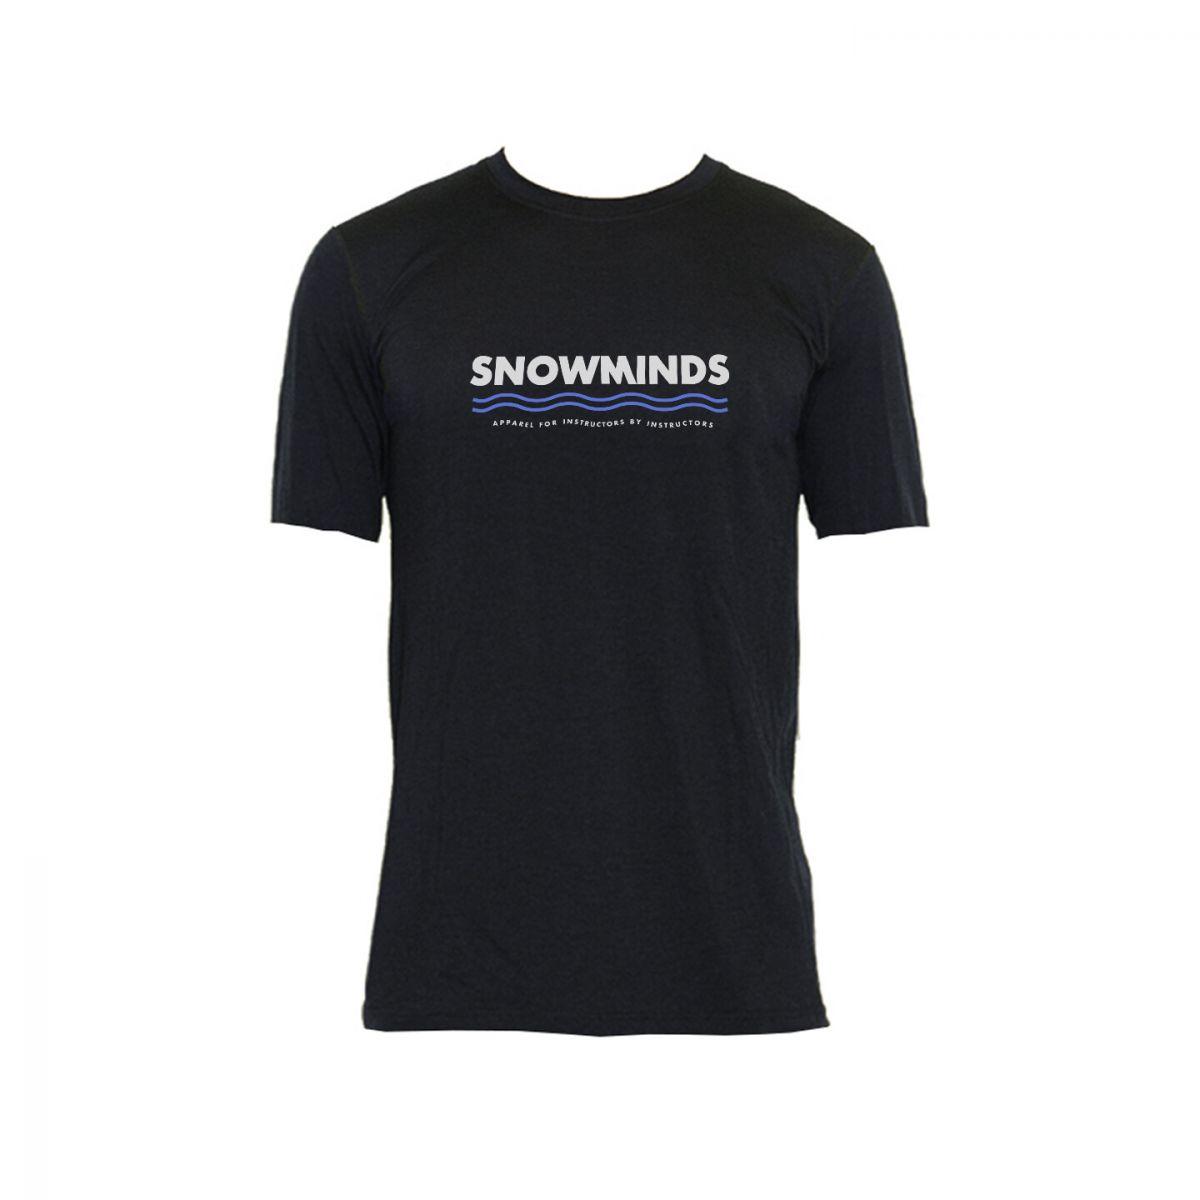 Merino Wool Tee - Snowminds - Grey - Unisex